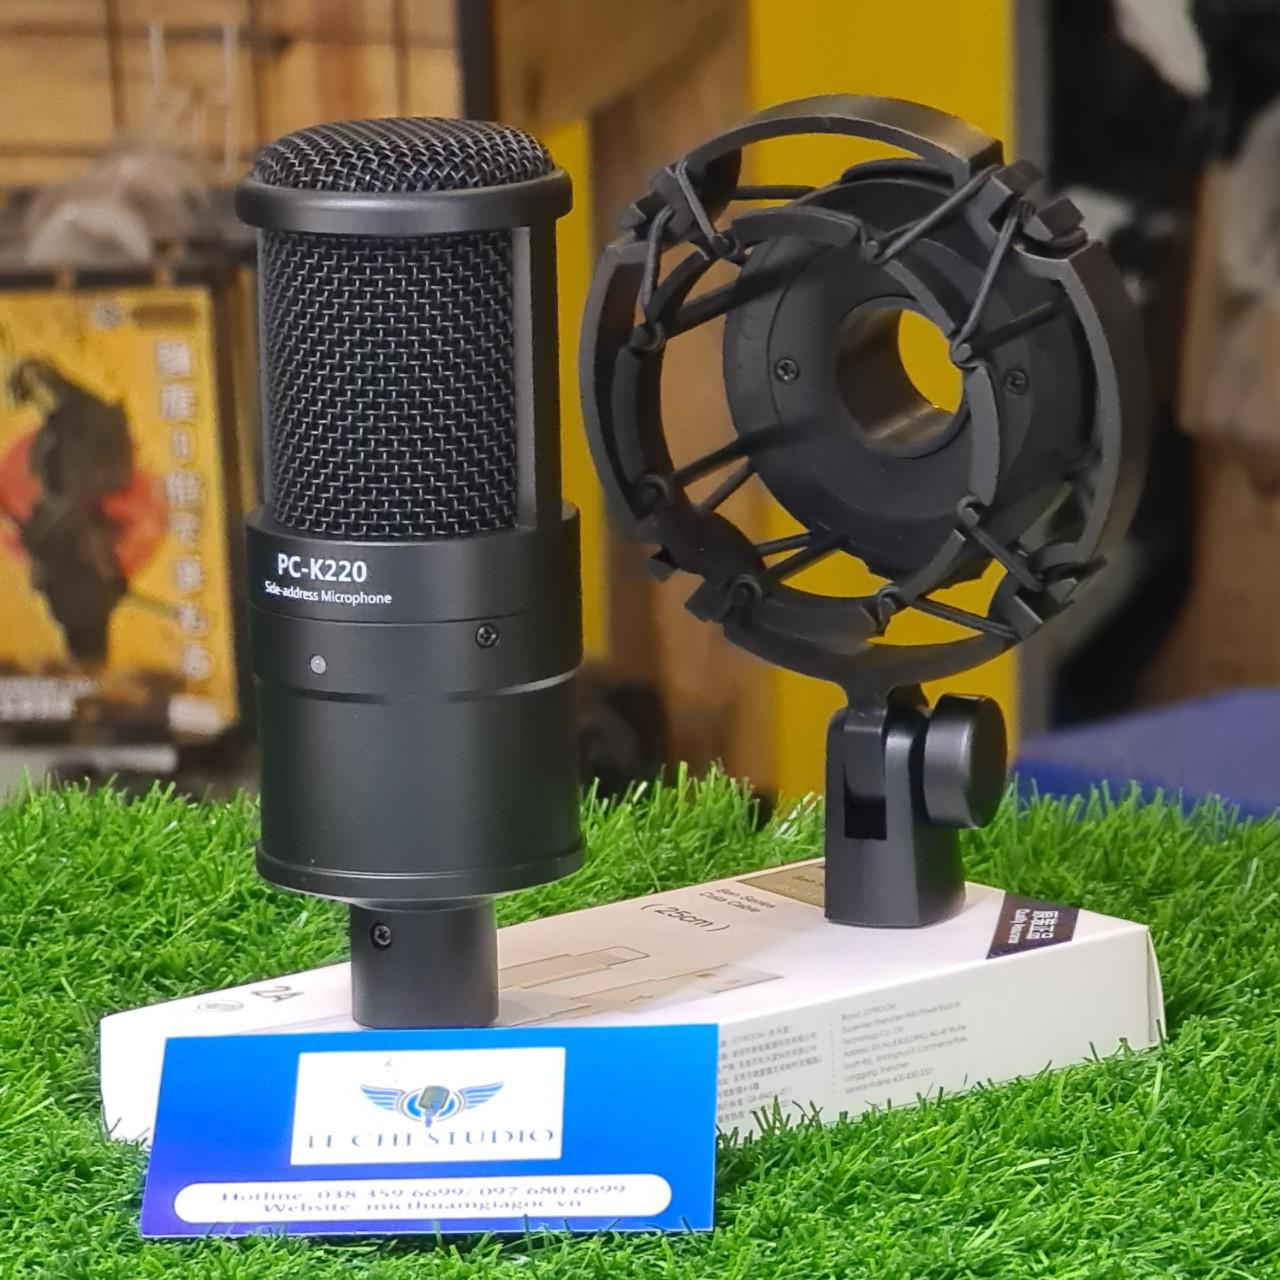 micro-thu-am-takstar-pc-k220-gia-850k